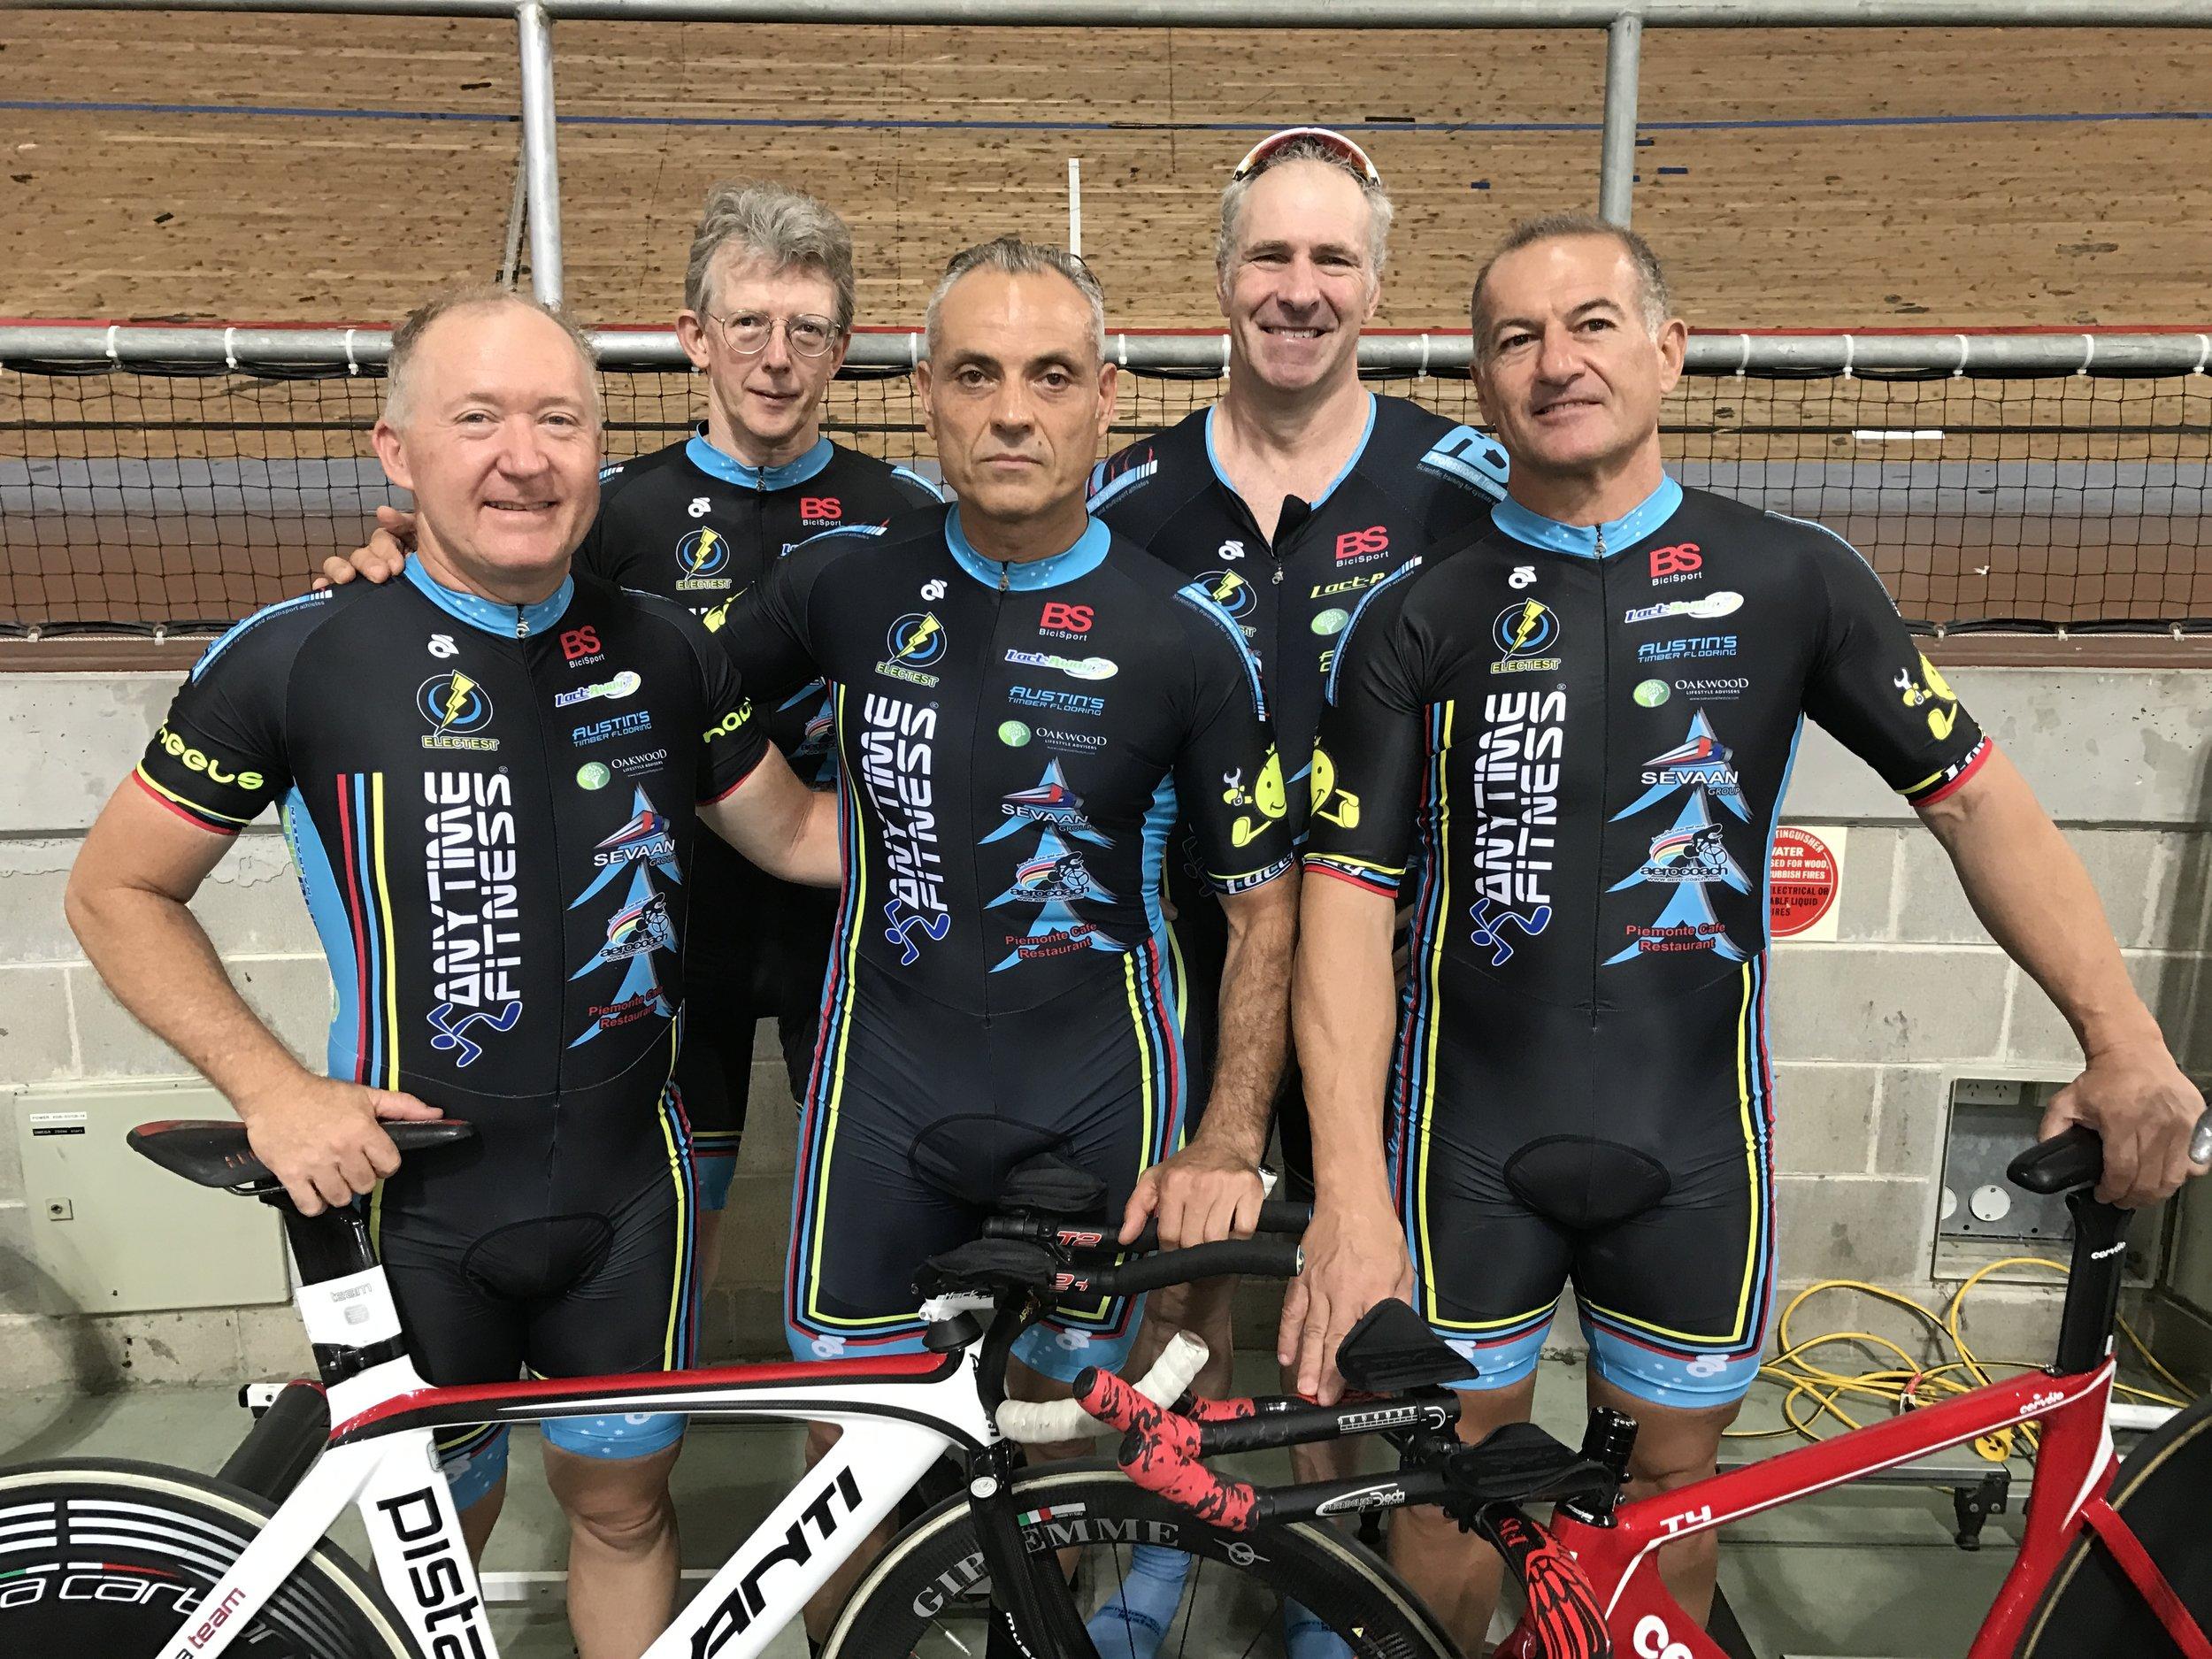 NSW Masters Track Championships - BiciSport 150+ Teams Pursuit squad of Graham Cockerton, Peter Verhoeven, Dom 'Mr 21 Seconds' Zumbo, James Thornton & Anthony Colantonio